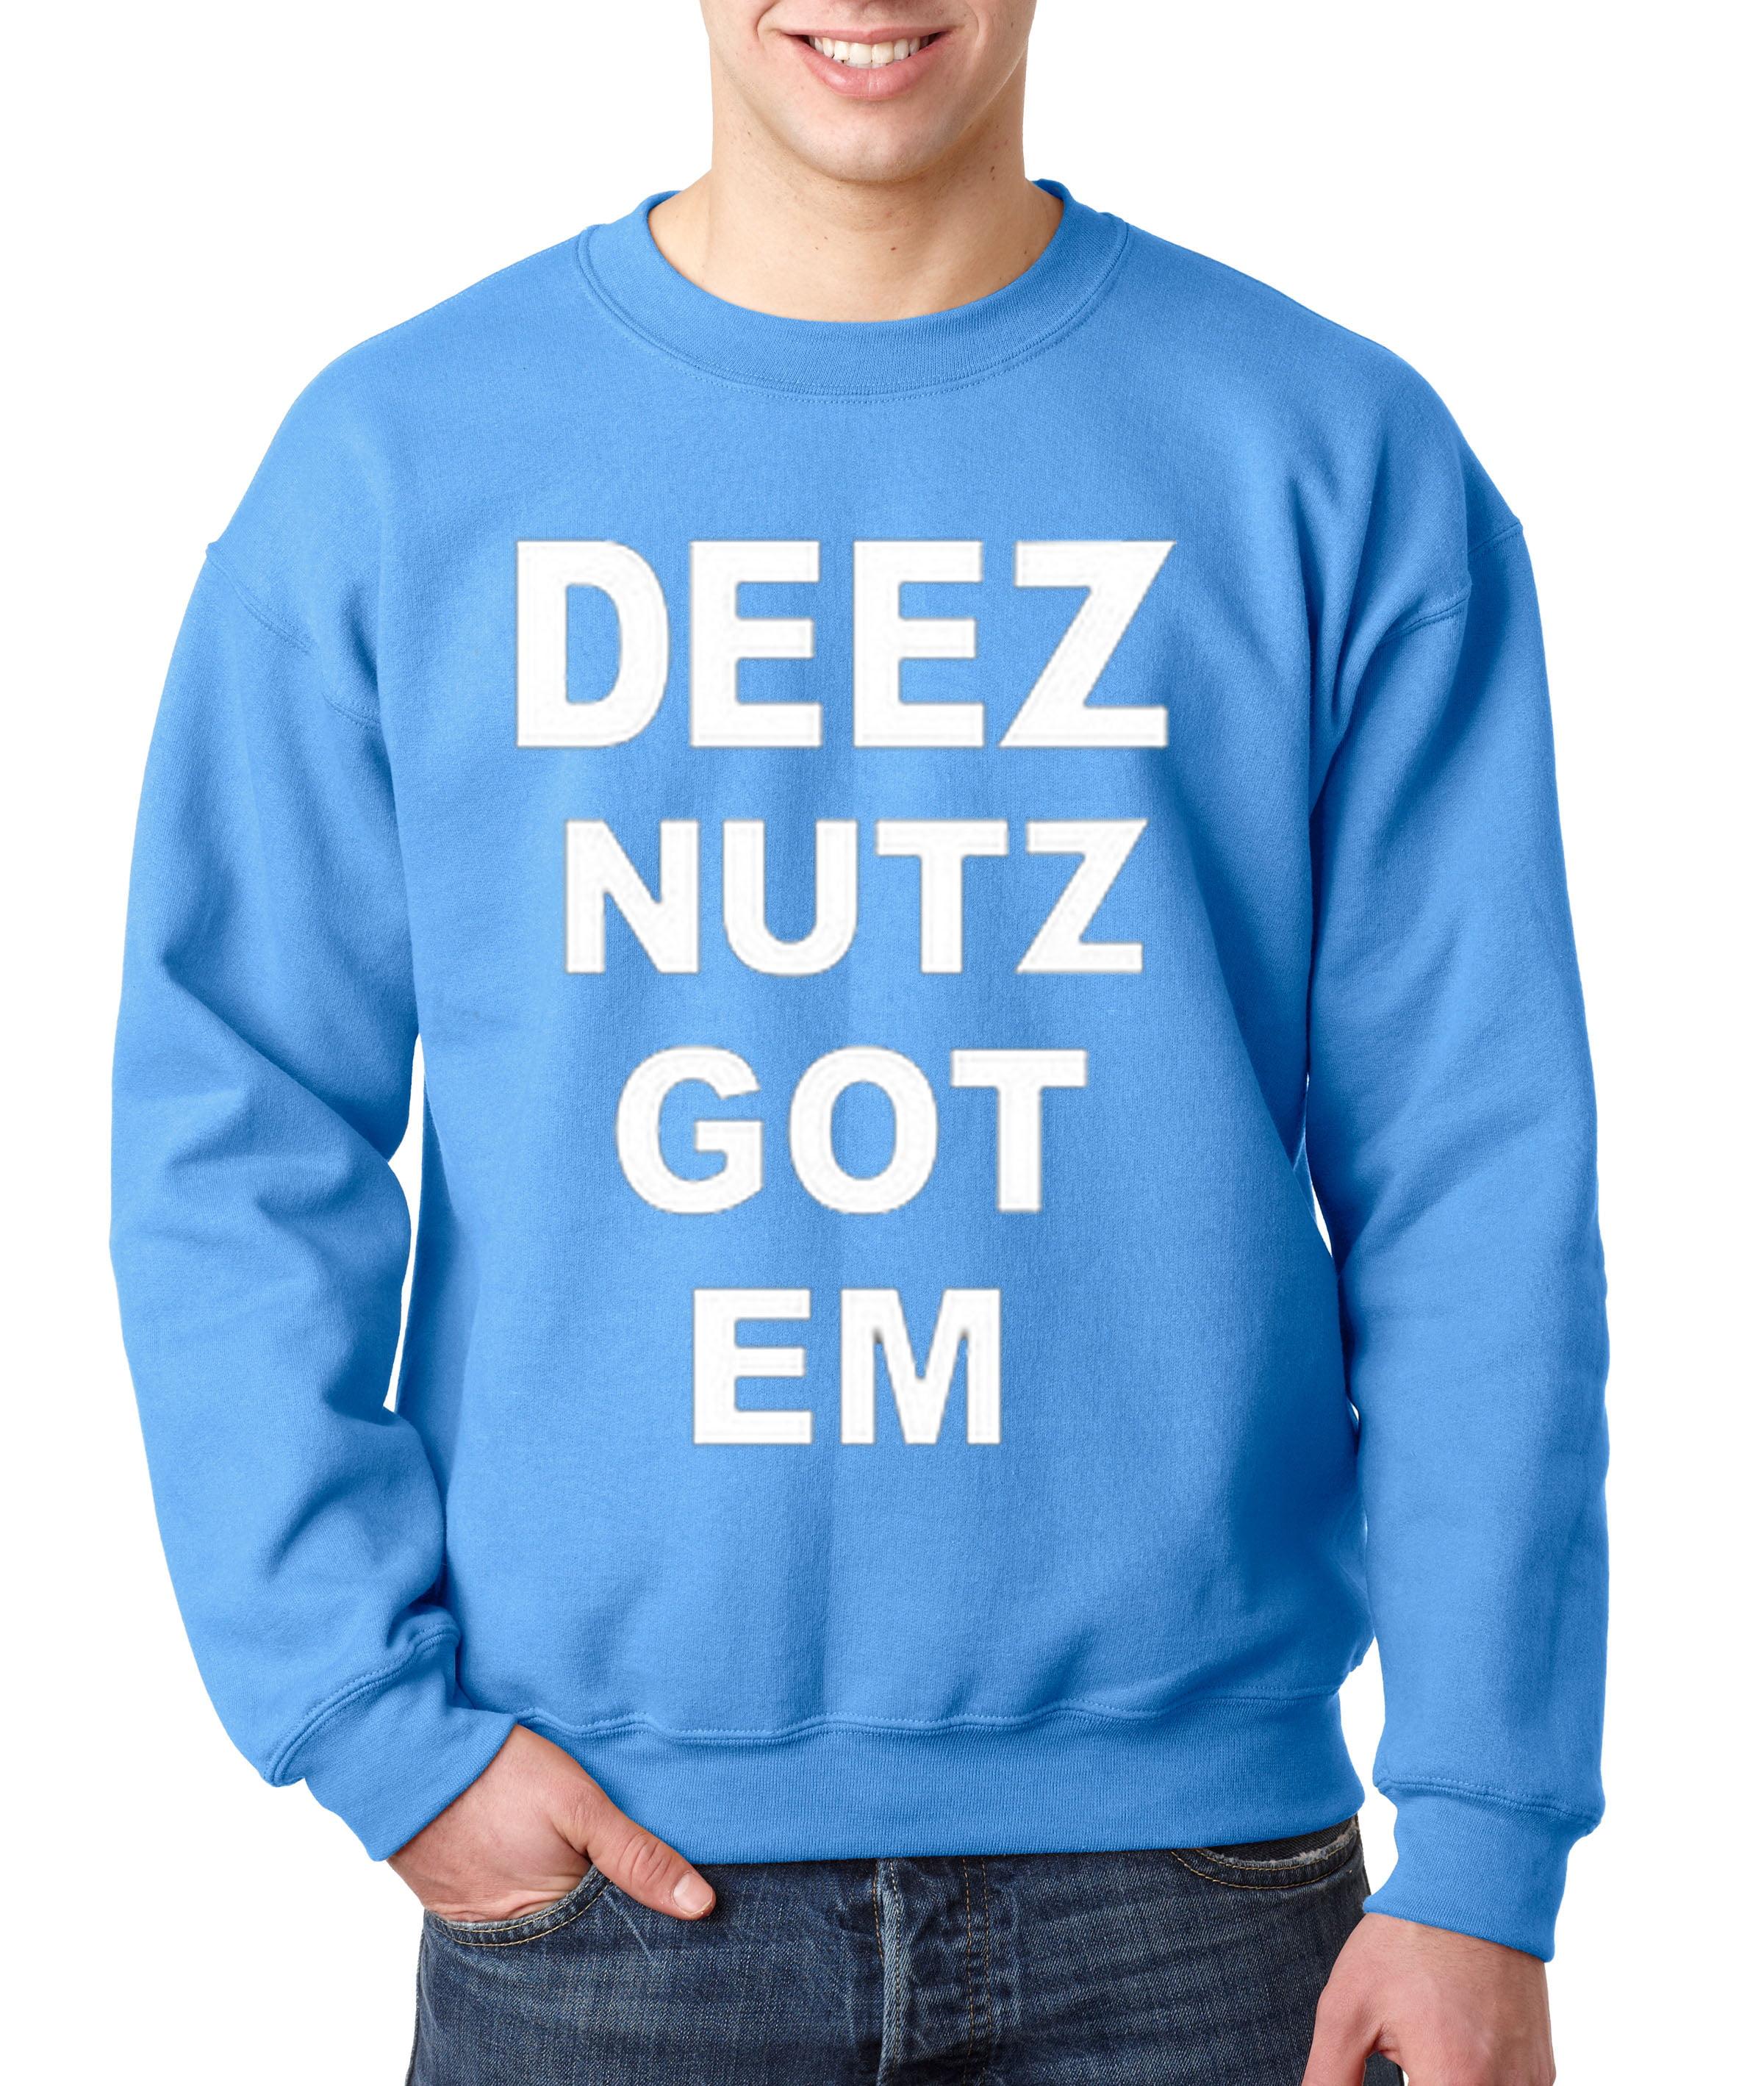 movie beach nuts Deez teen